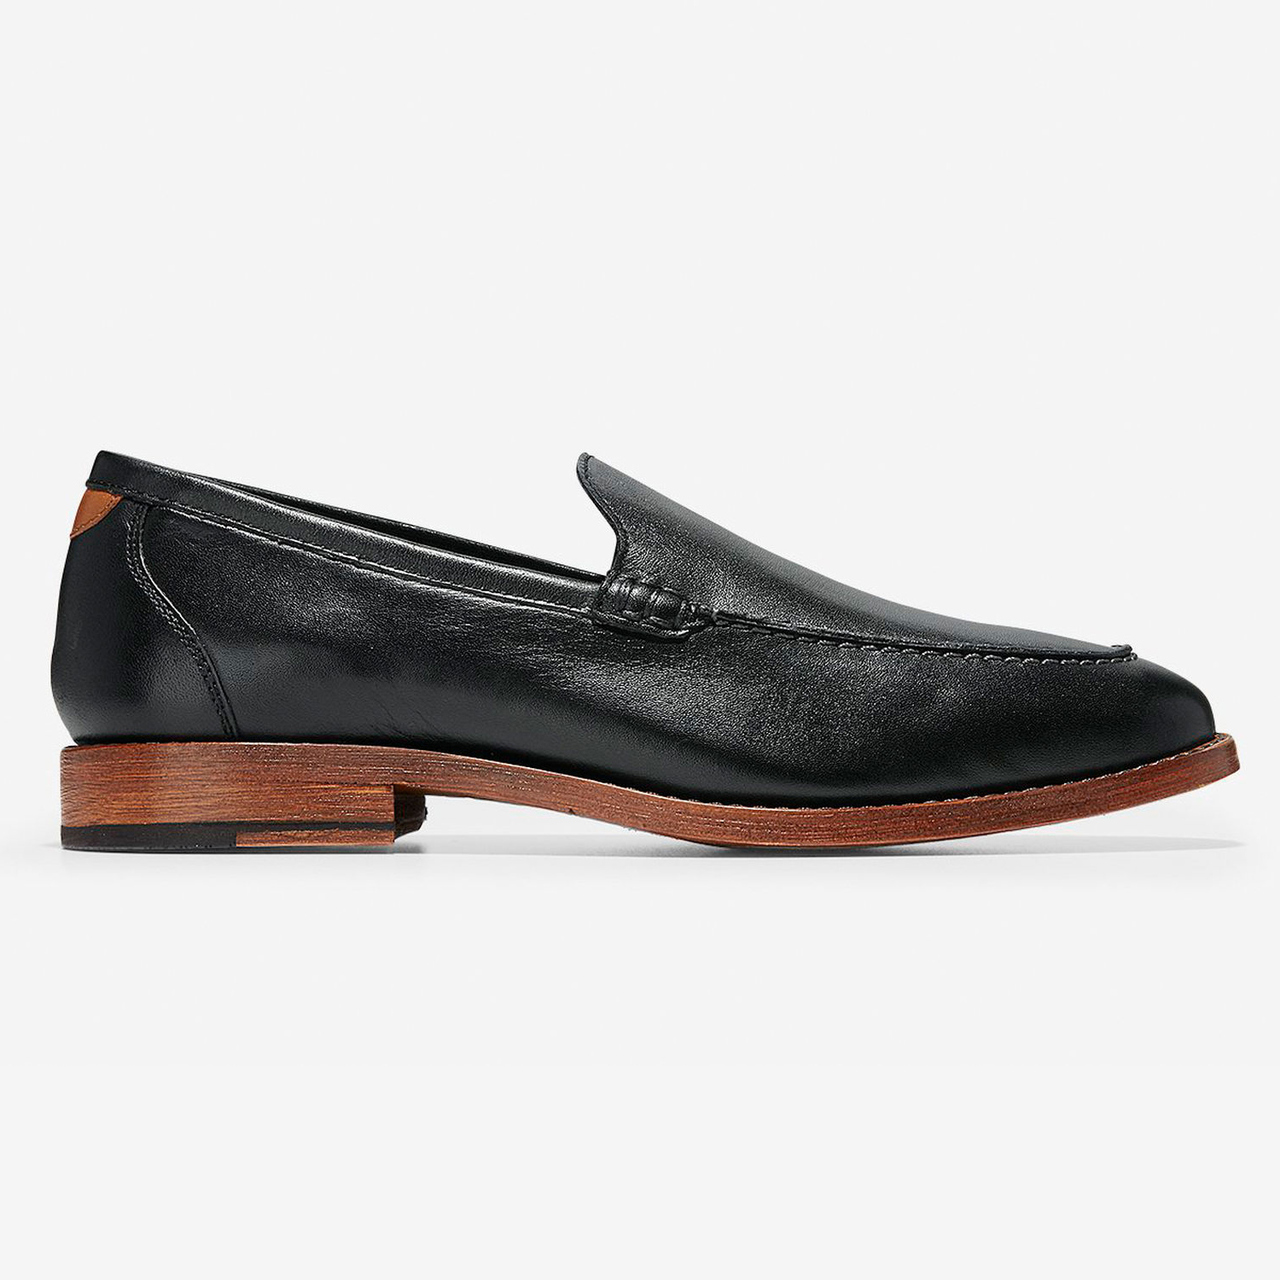 0fce048a6 ShoeStores.com   Cole Haan Feathercraft Grand Venetian Loafer - Black